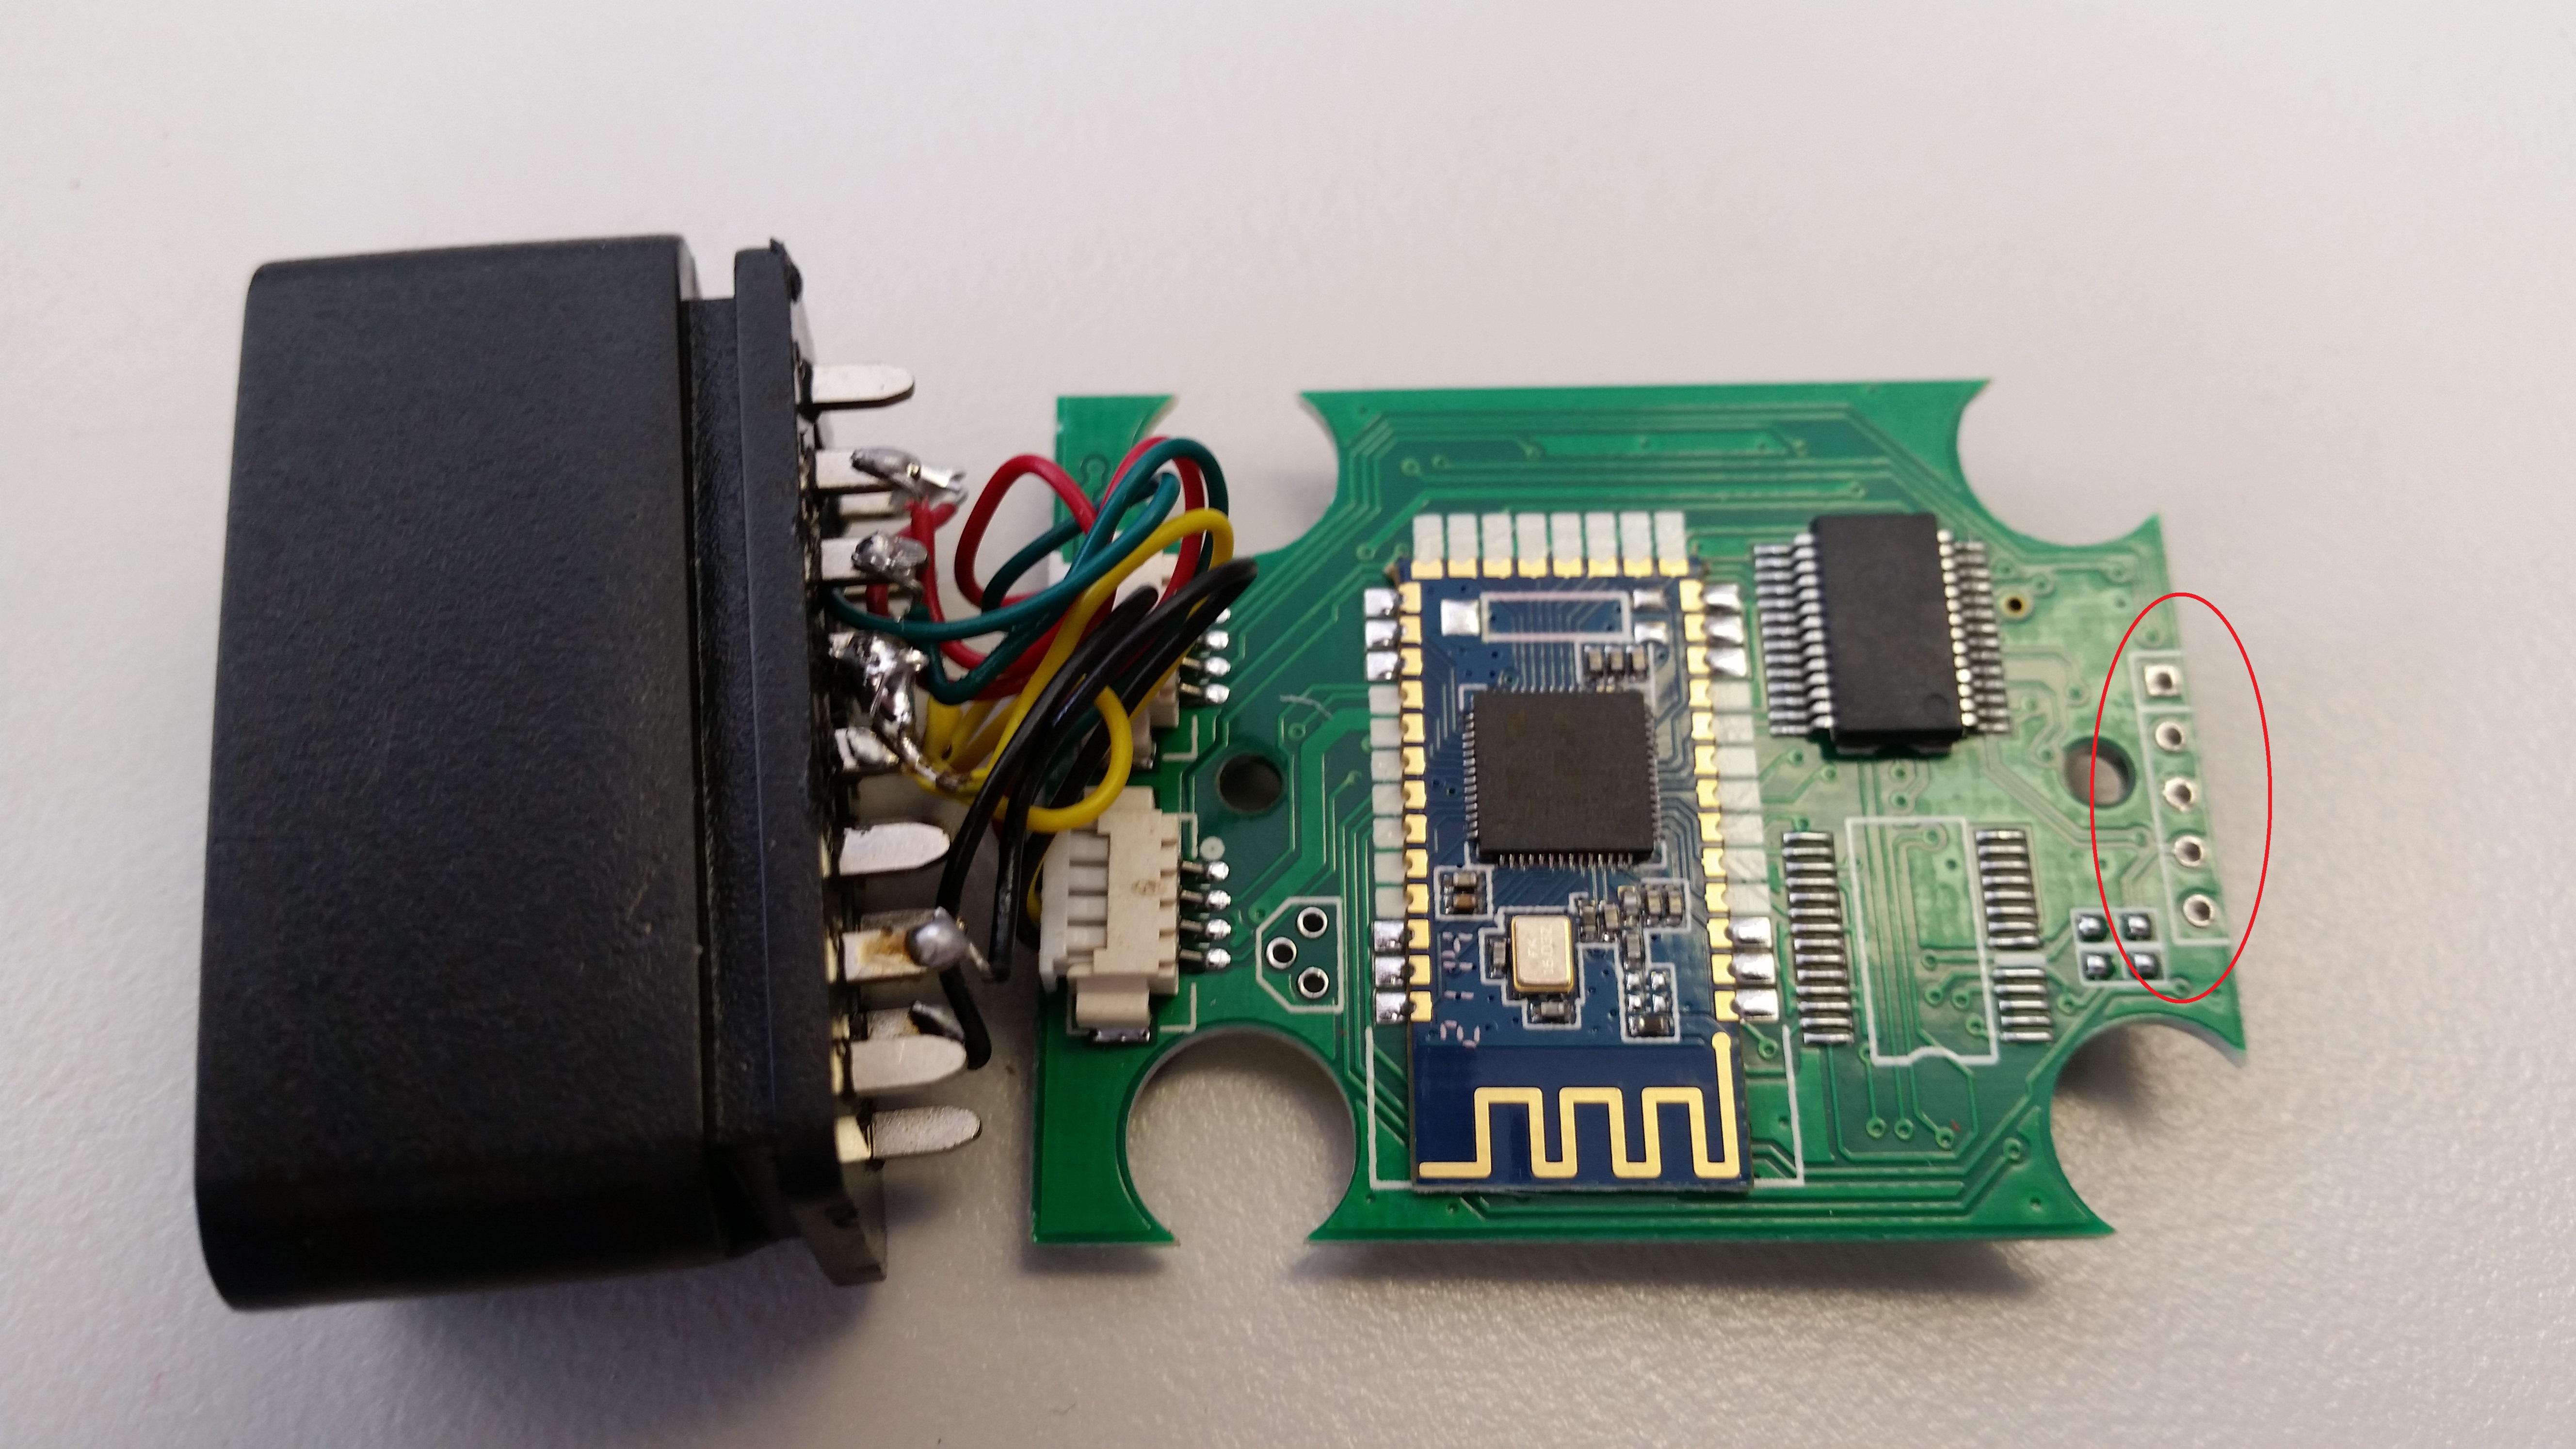 ELM327 hacking - Area515